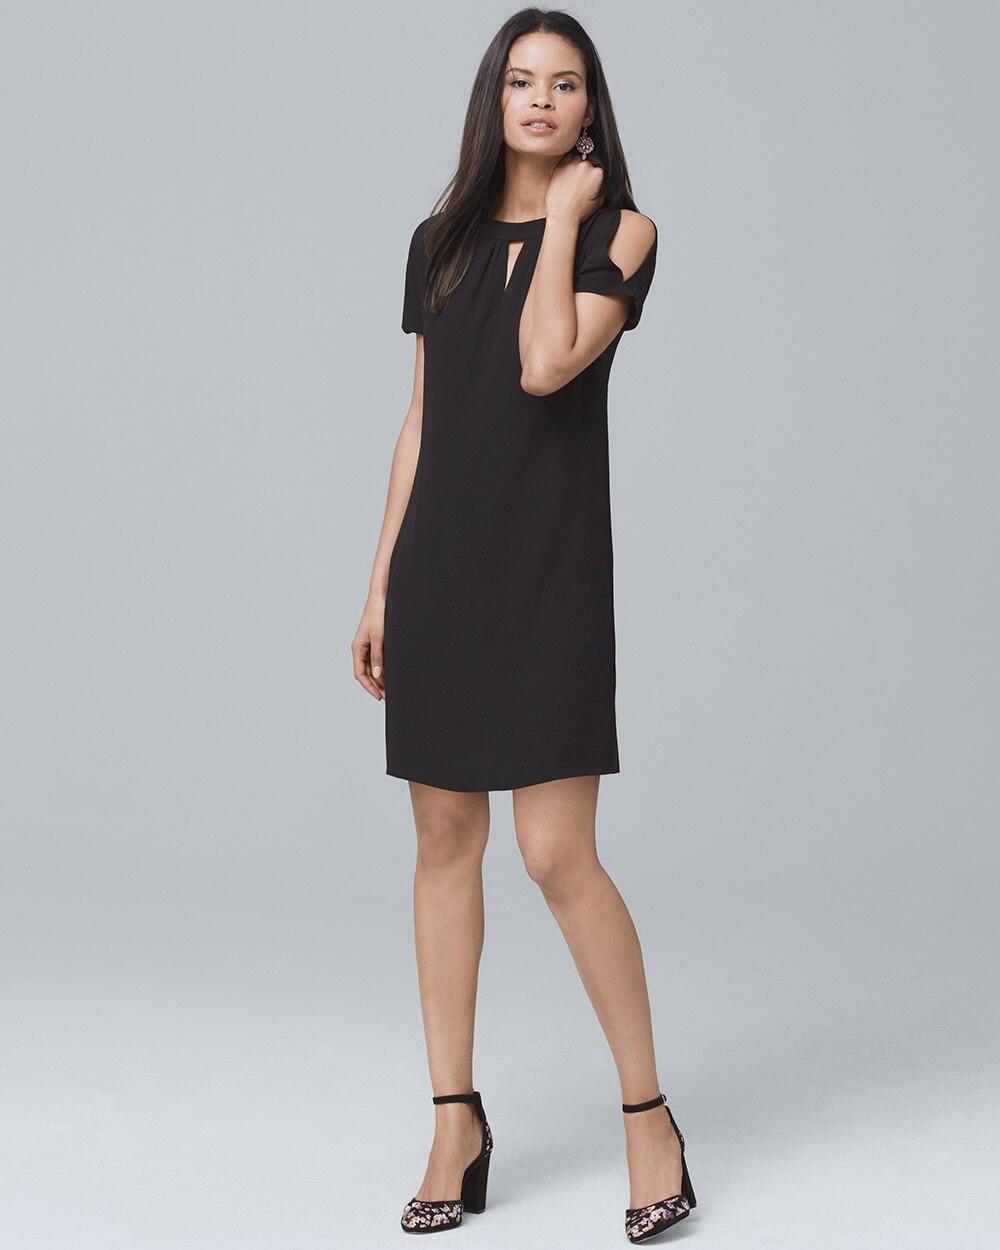 e0c2a1f089fc Short-Sleeve Black Cold-Shoulder Shift Dress - White House Black Market